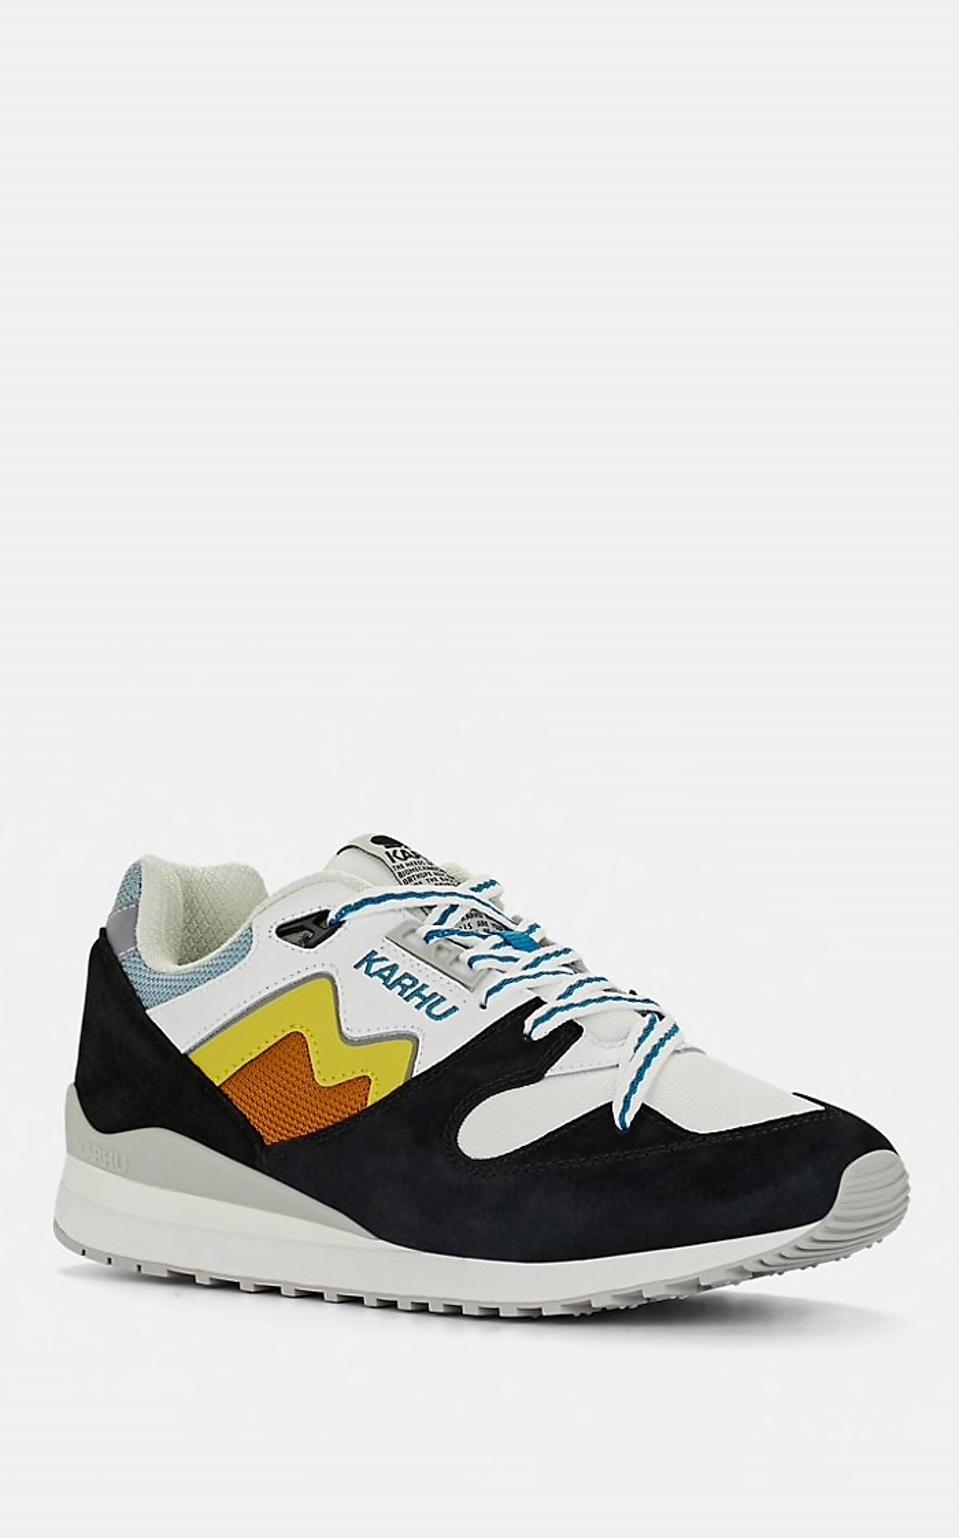 Karhu Men's Synchron Classic Sneaker